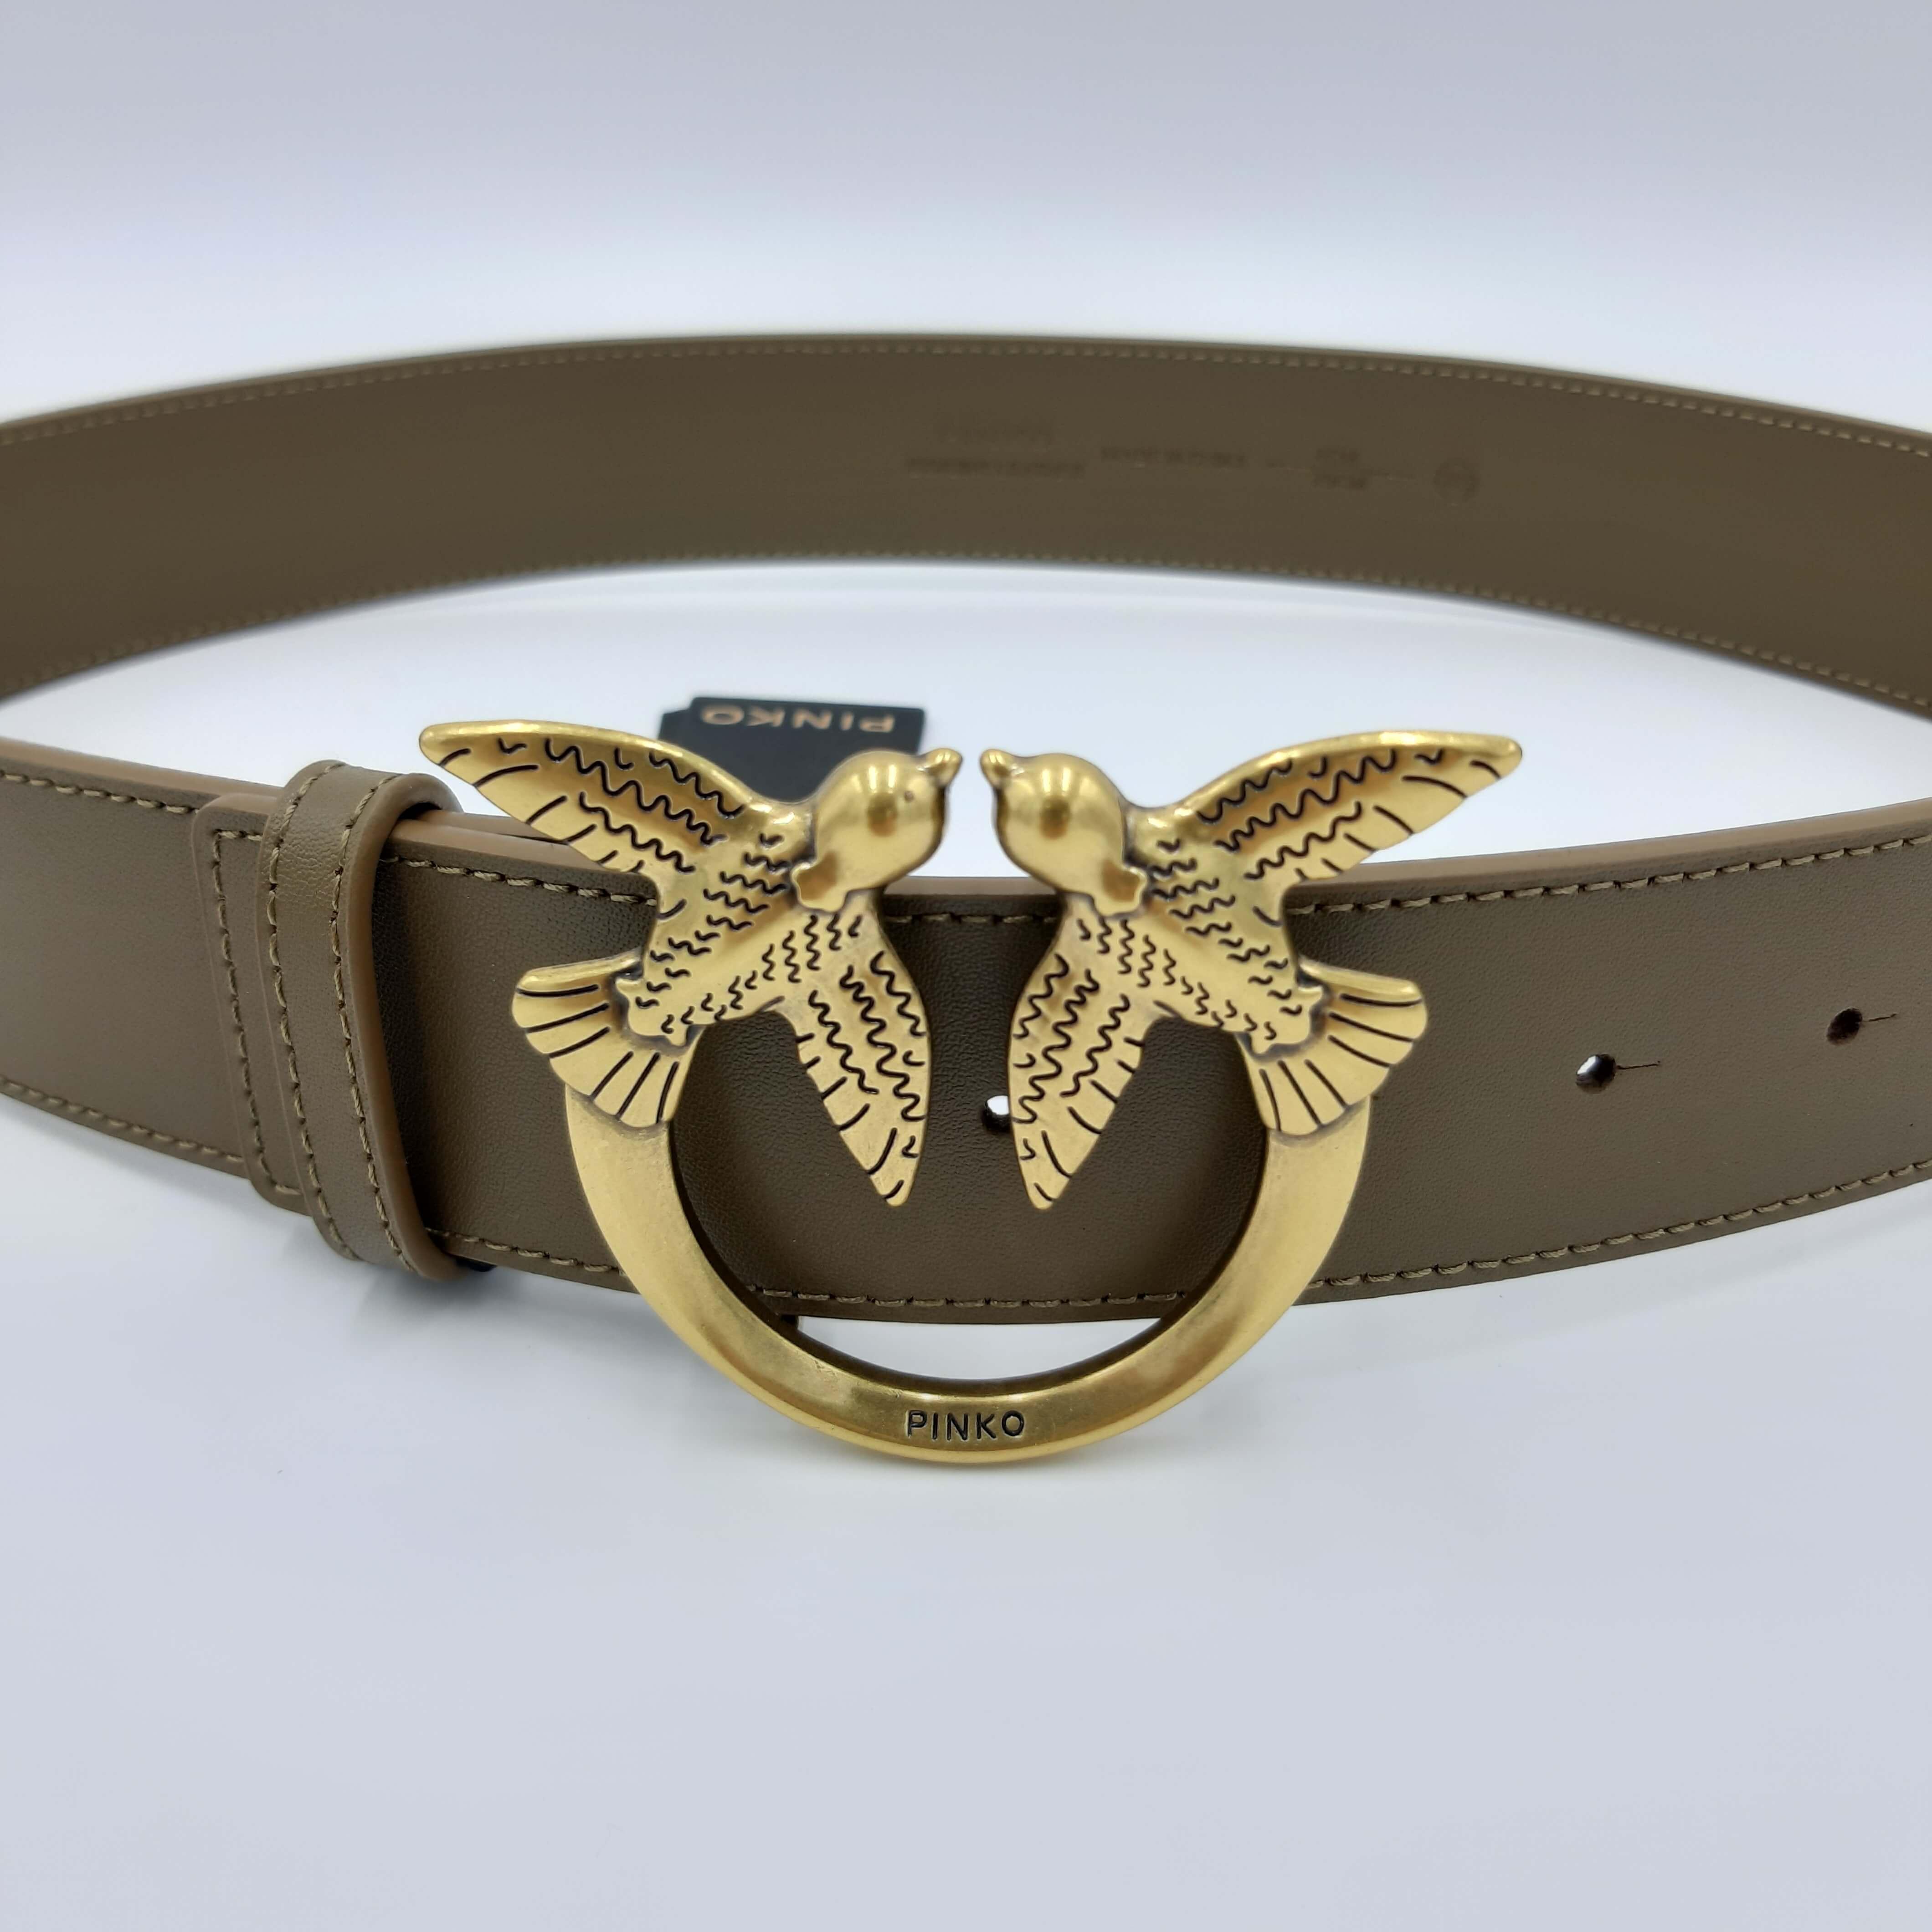 Cintura Love Berry Simply Belt H4 verde militare Pinko